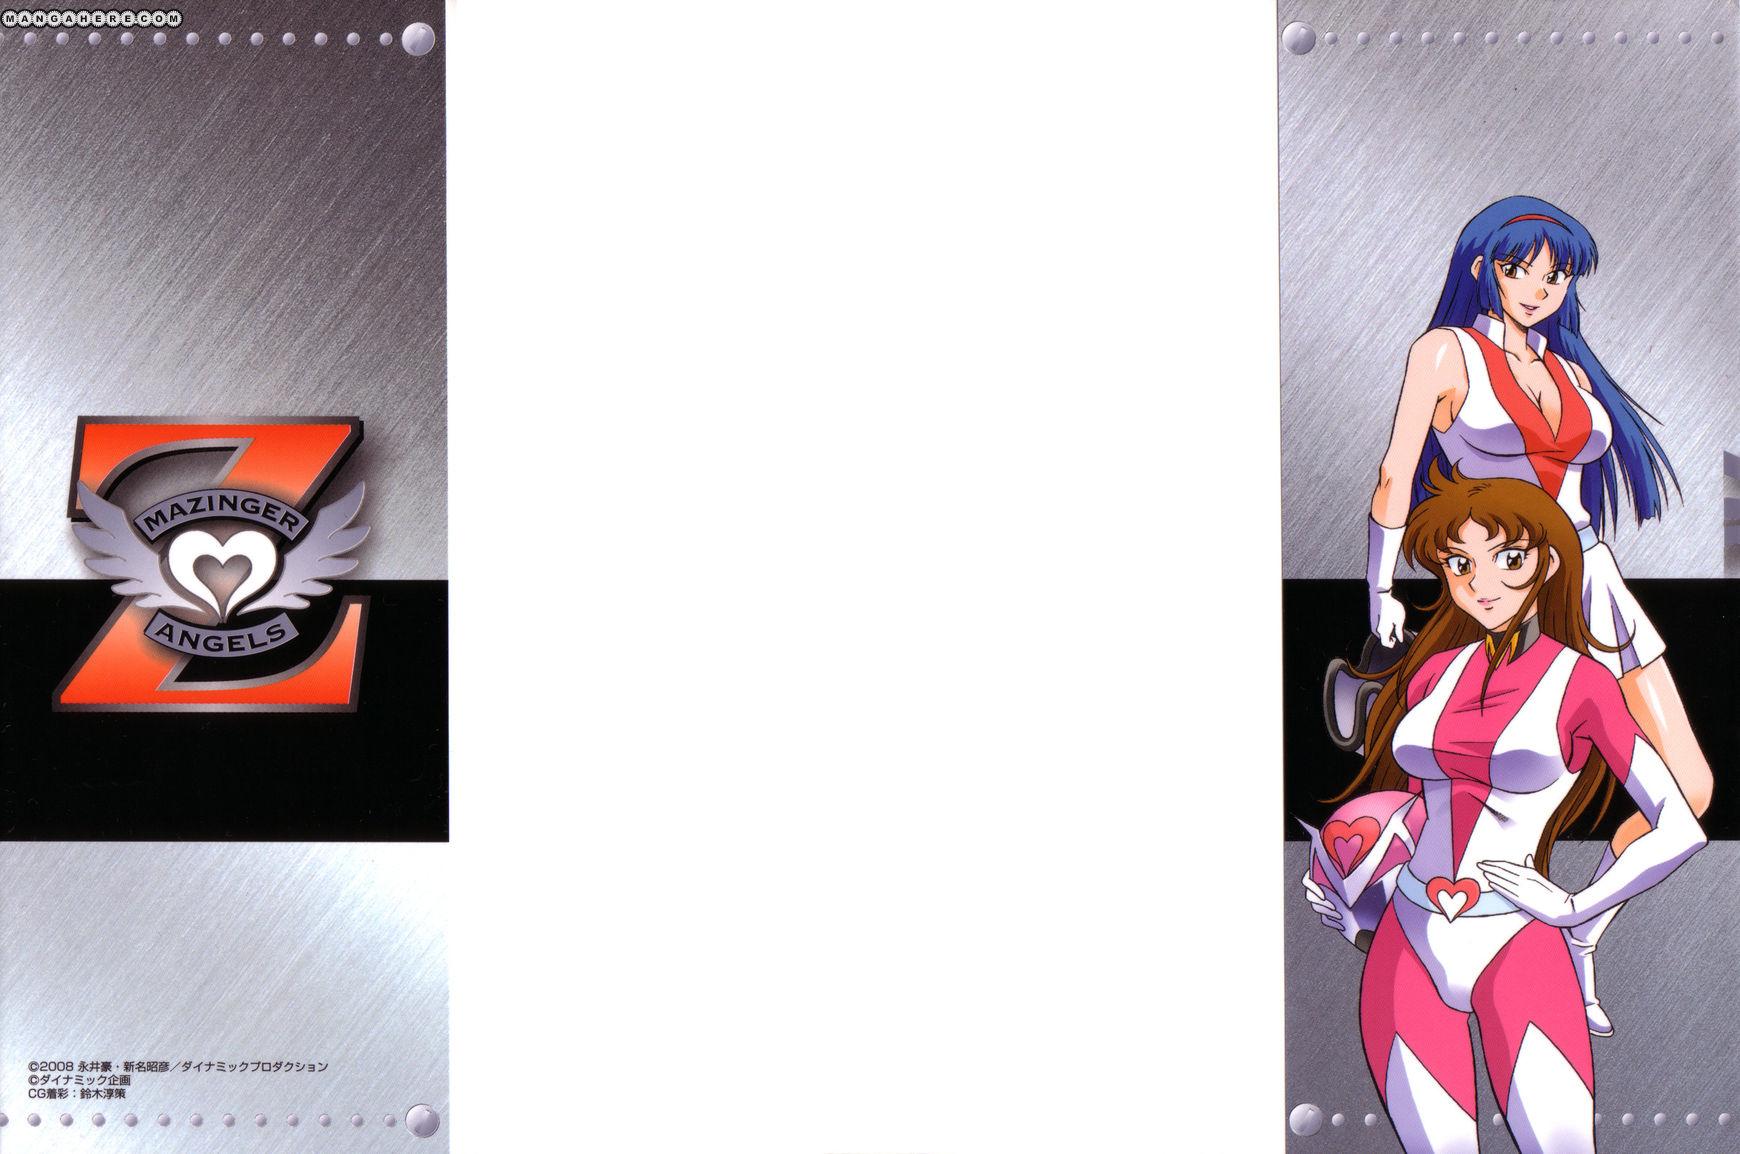 Mazinger Angel Z 1 Page 2